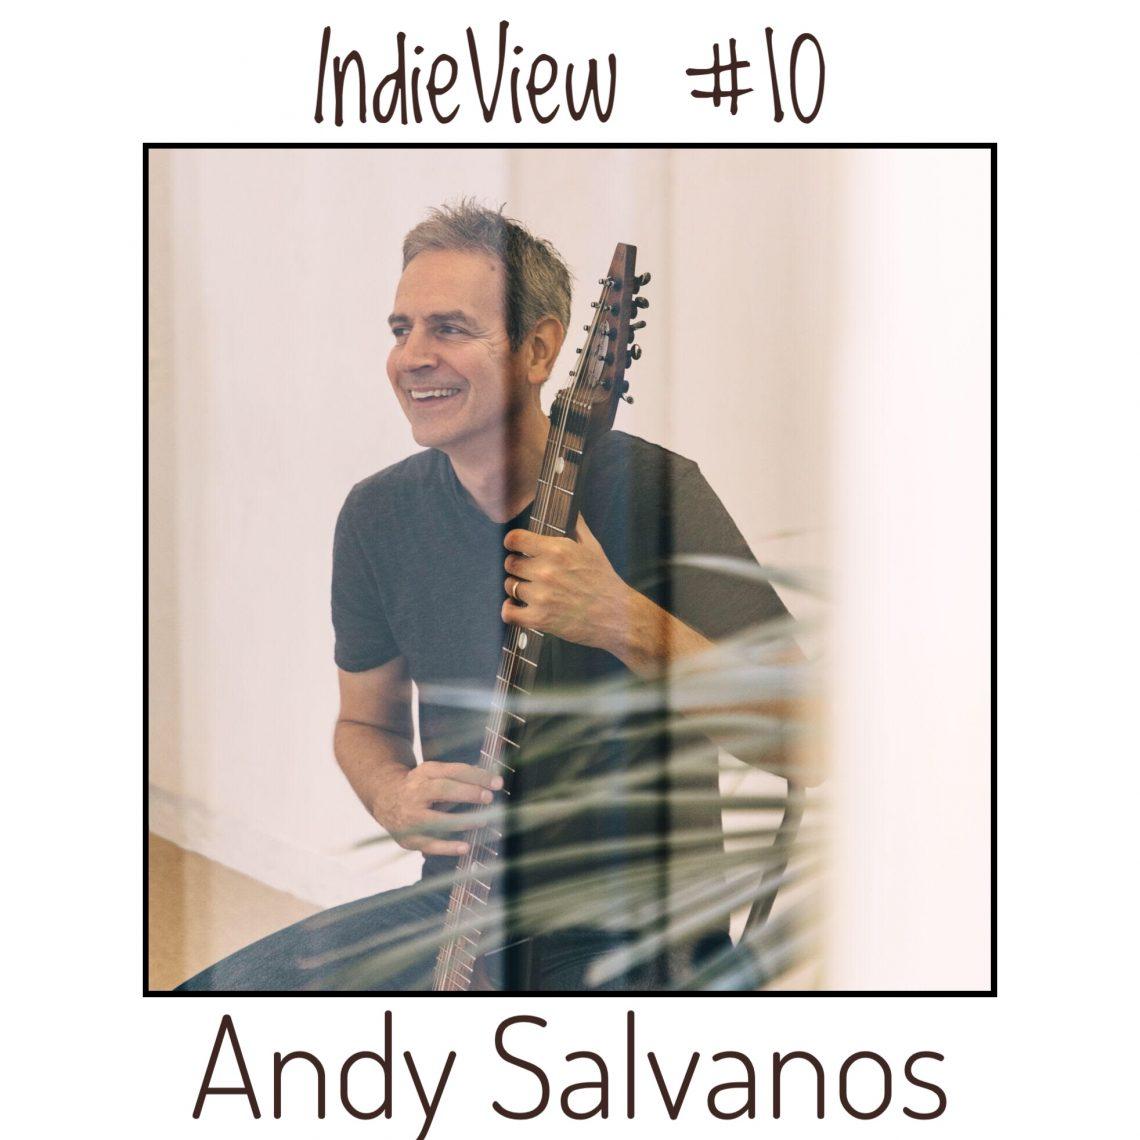 Andy Salvanos (Chapman Stick) IndieView #10 - IndieViews Series